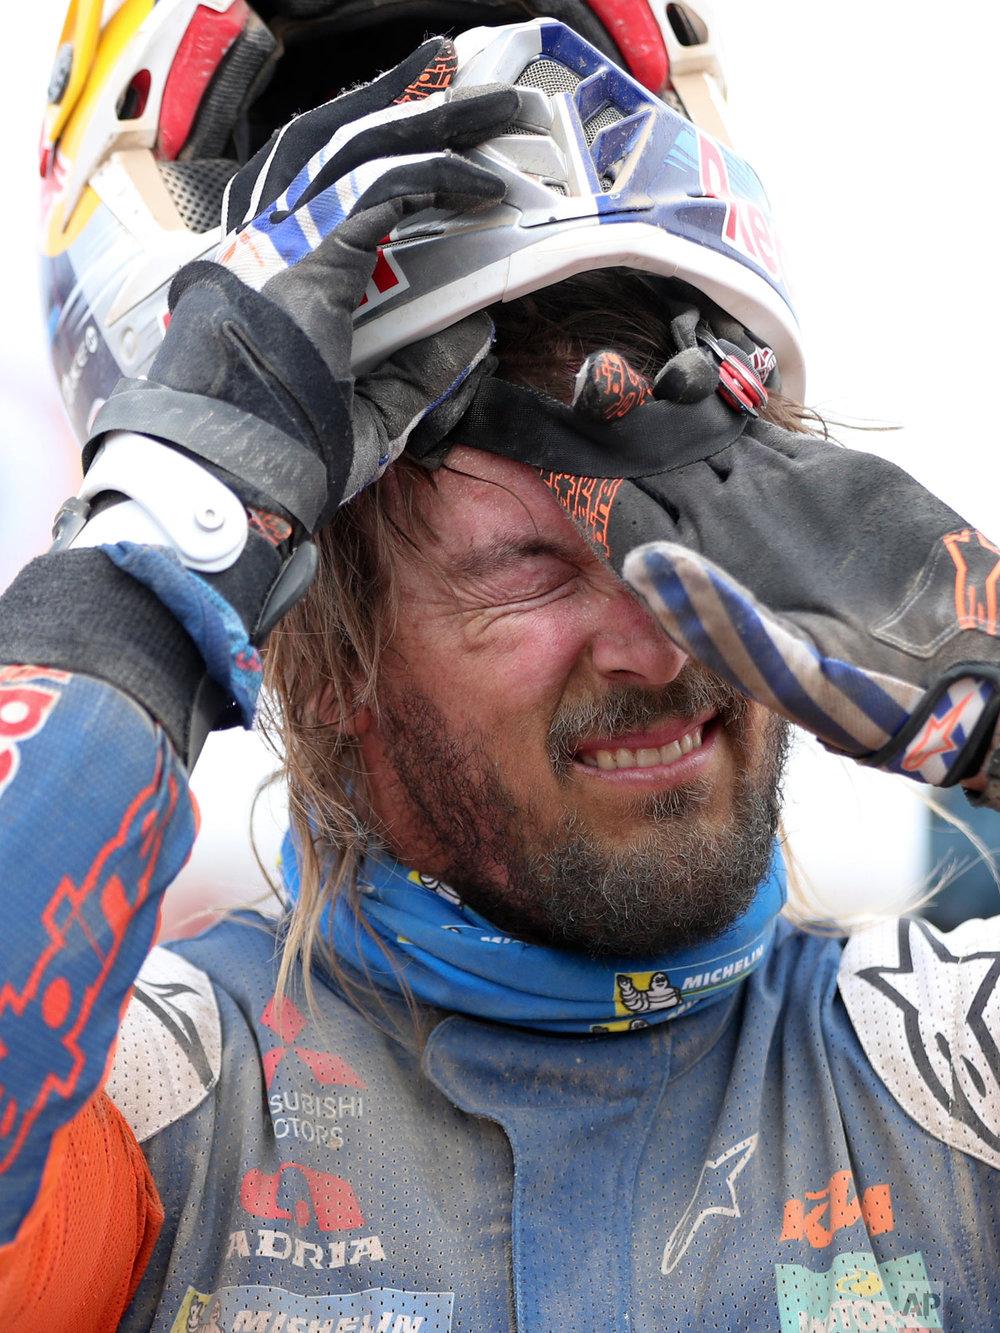 KTM motorbike rider Toby Price removes his helmet in Peru, Jan. 9, 2019. (AP Photo/Ricardo Mazalan)